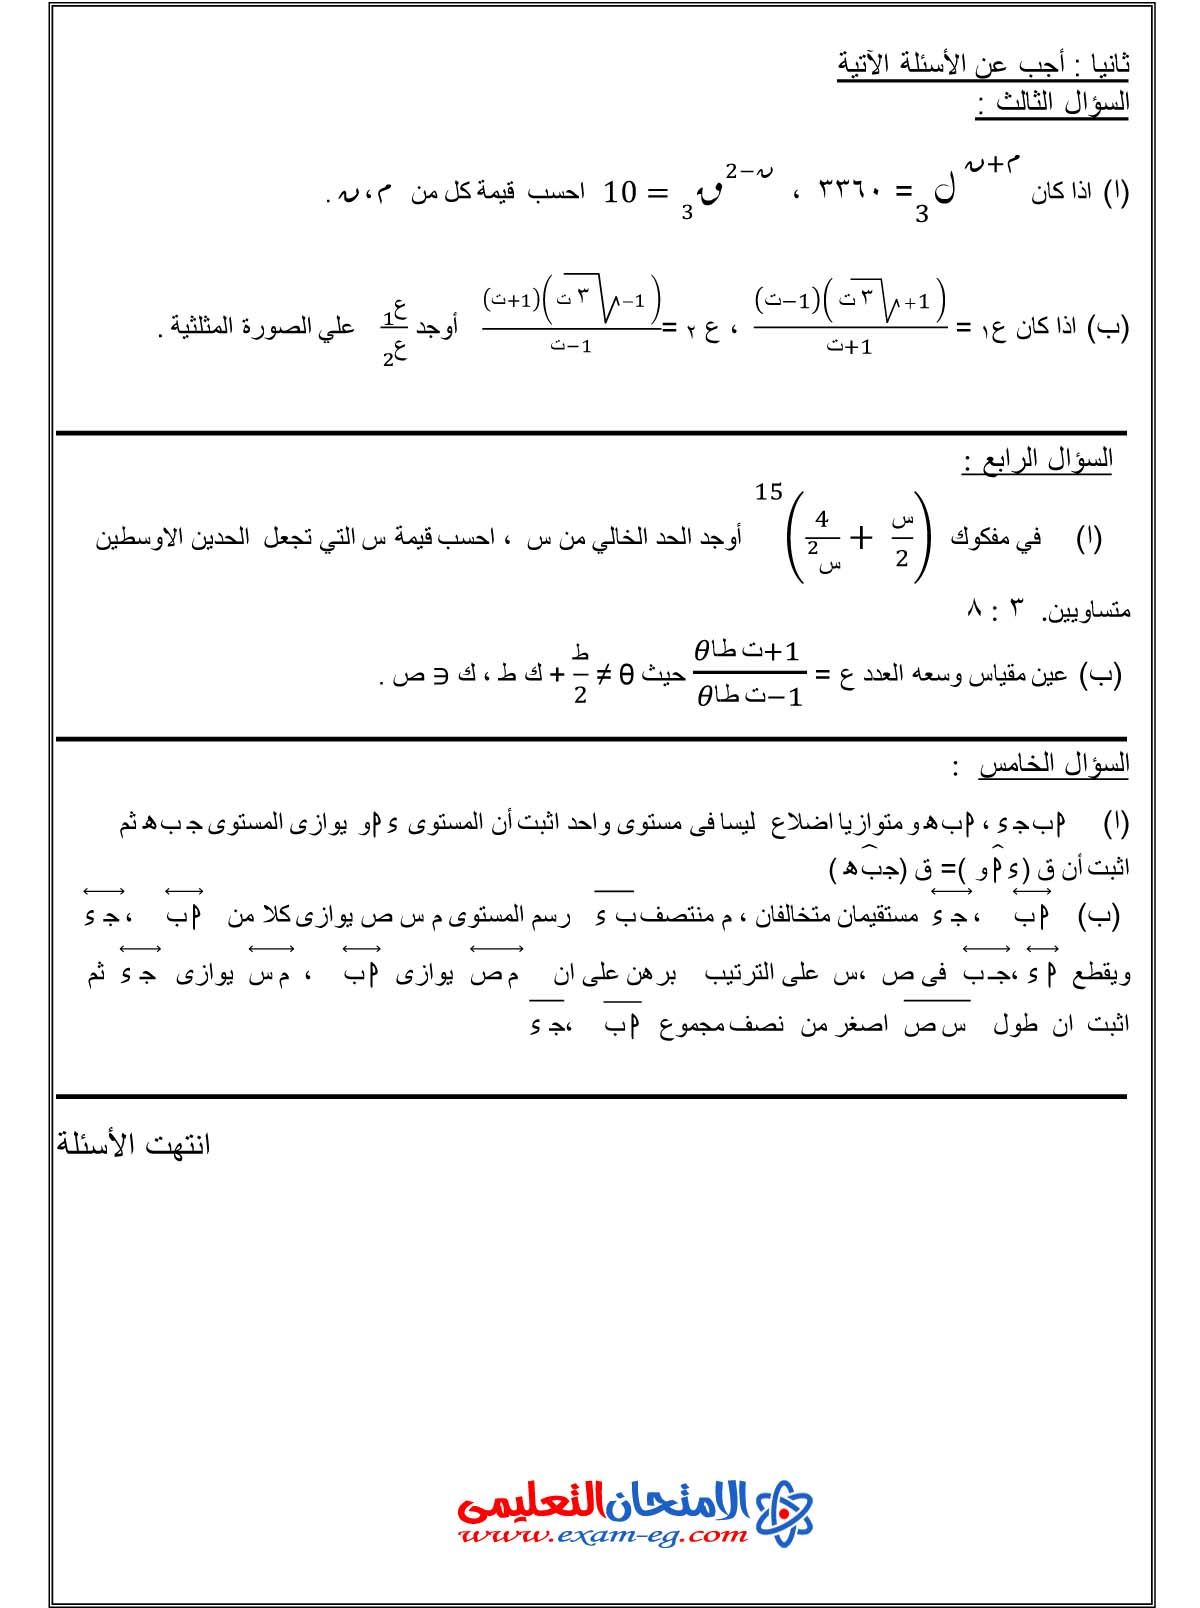 exam-eg.com_1460421183338.jpg